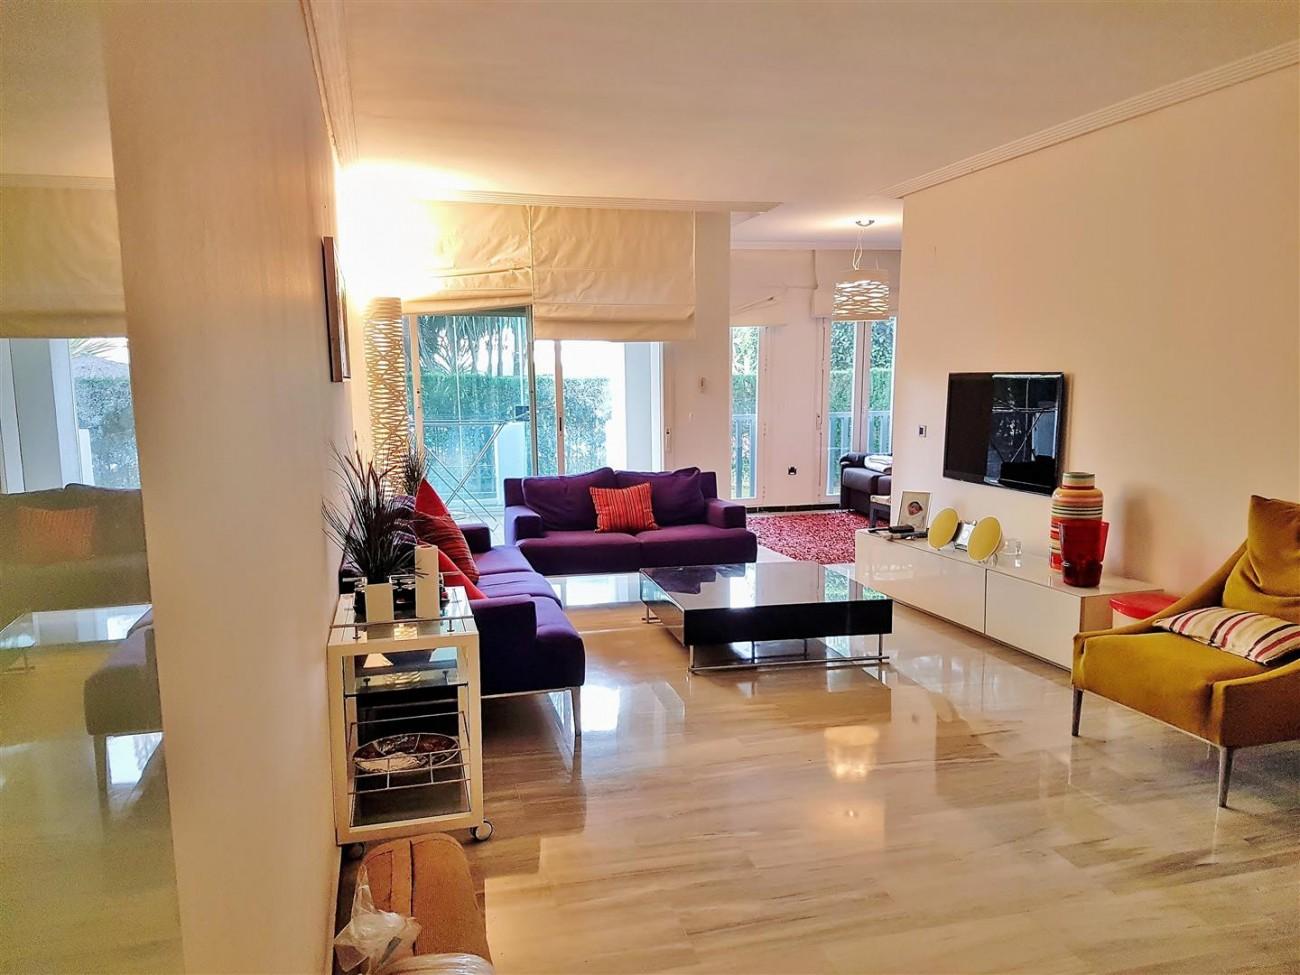 Beachside Apartment for sale Puerto Banus Marbella (2) (Large)